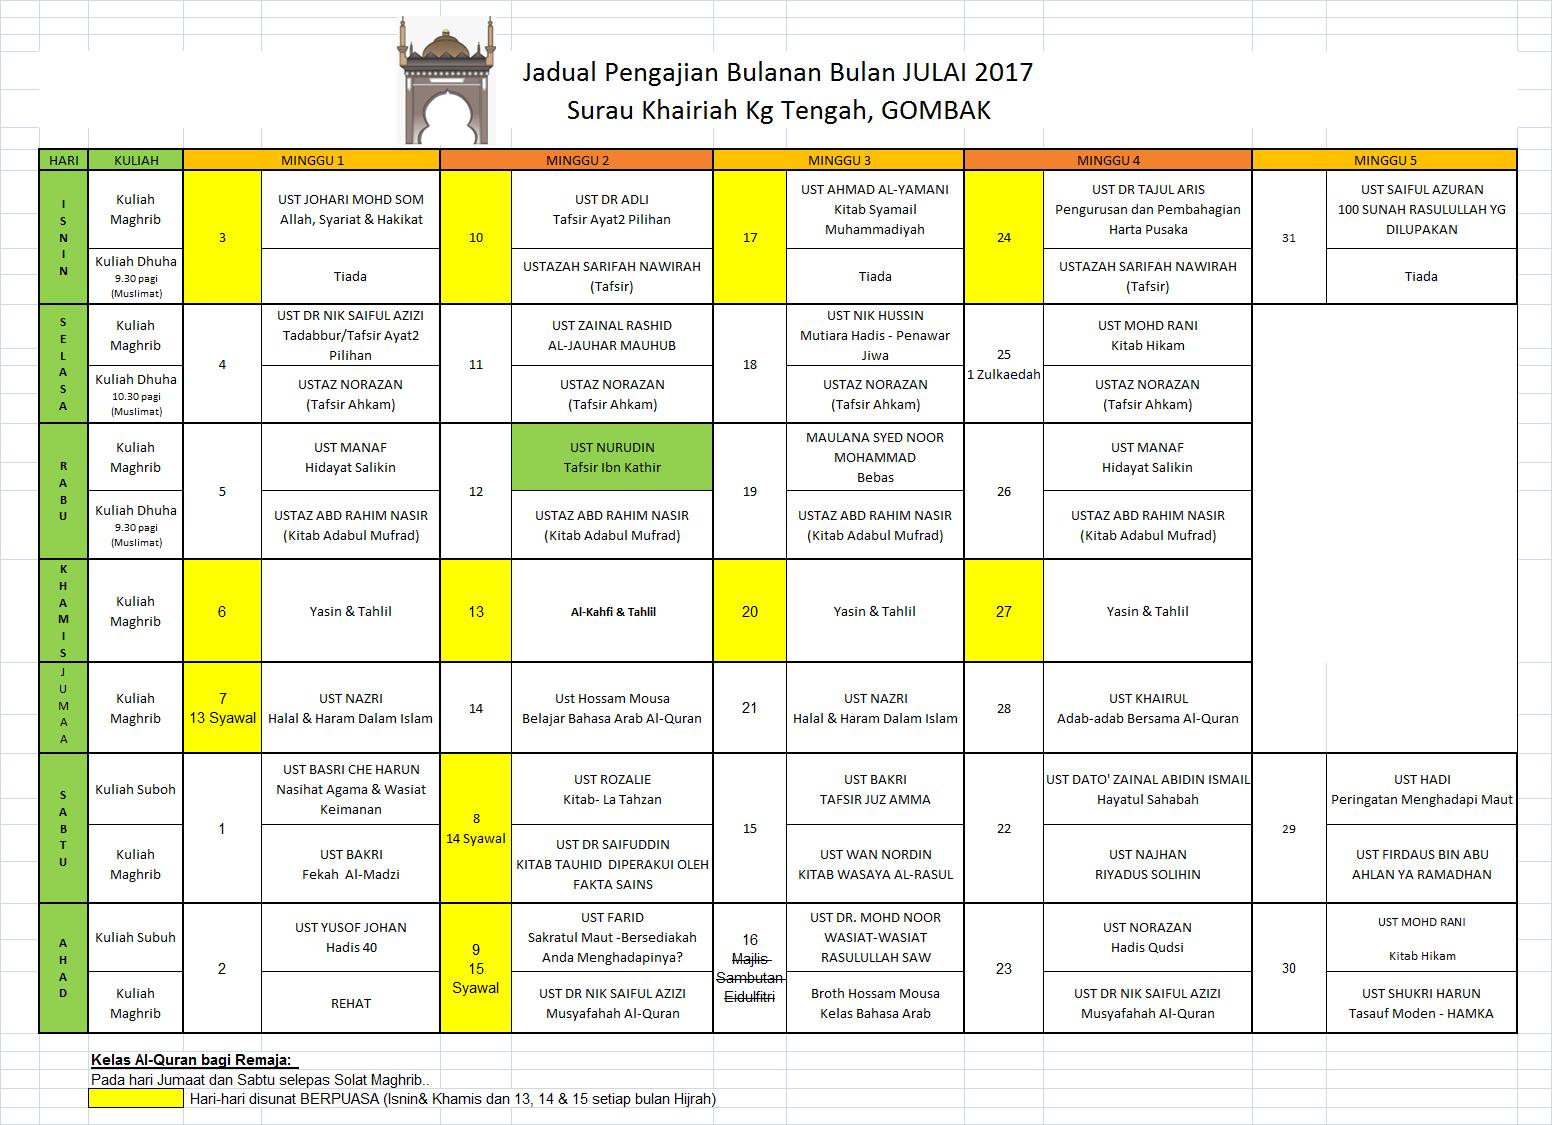 Jadual Julai 17